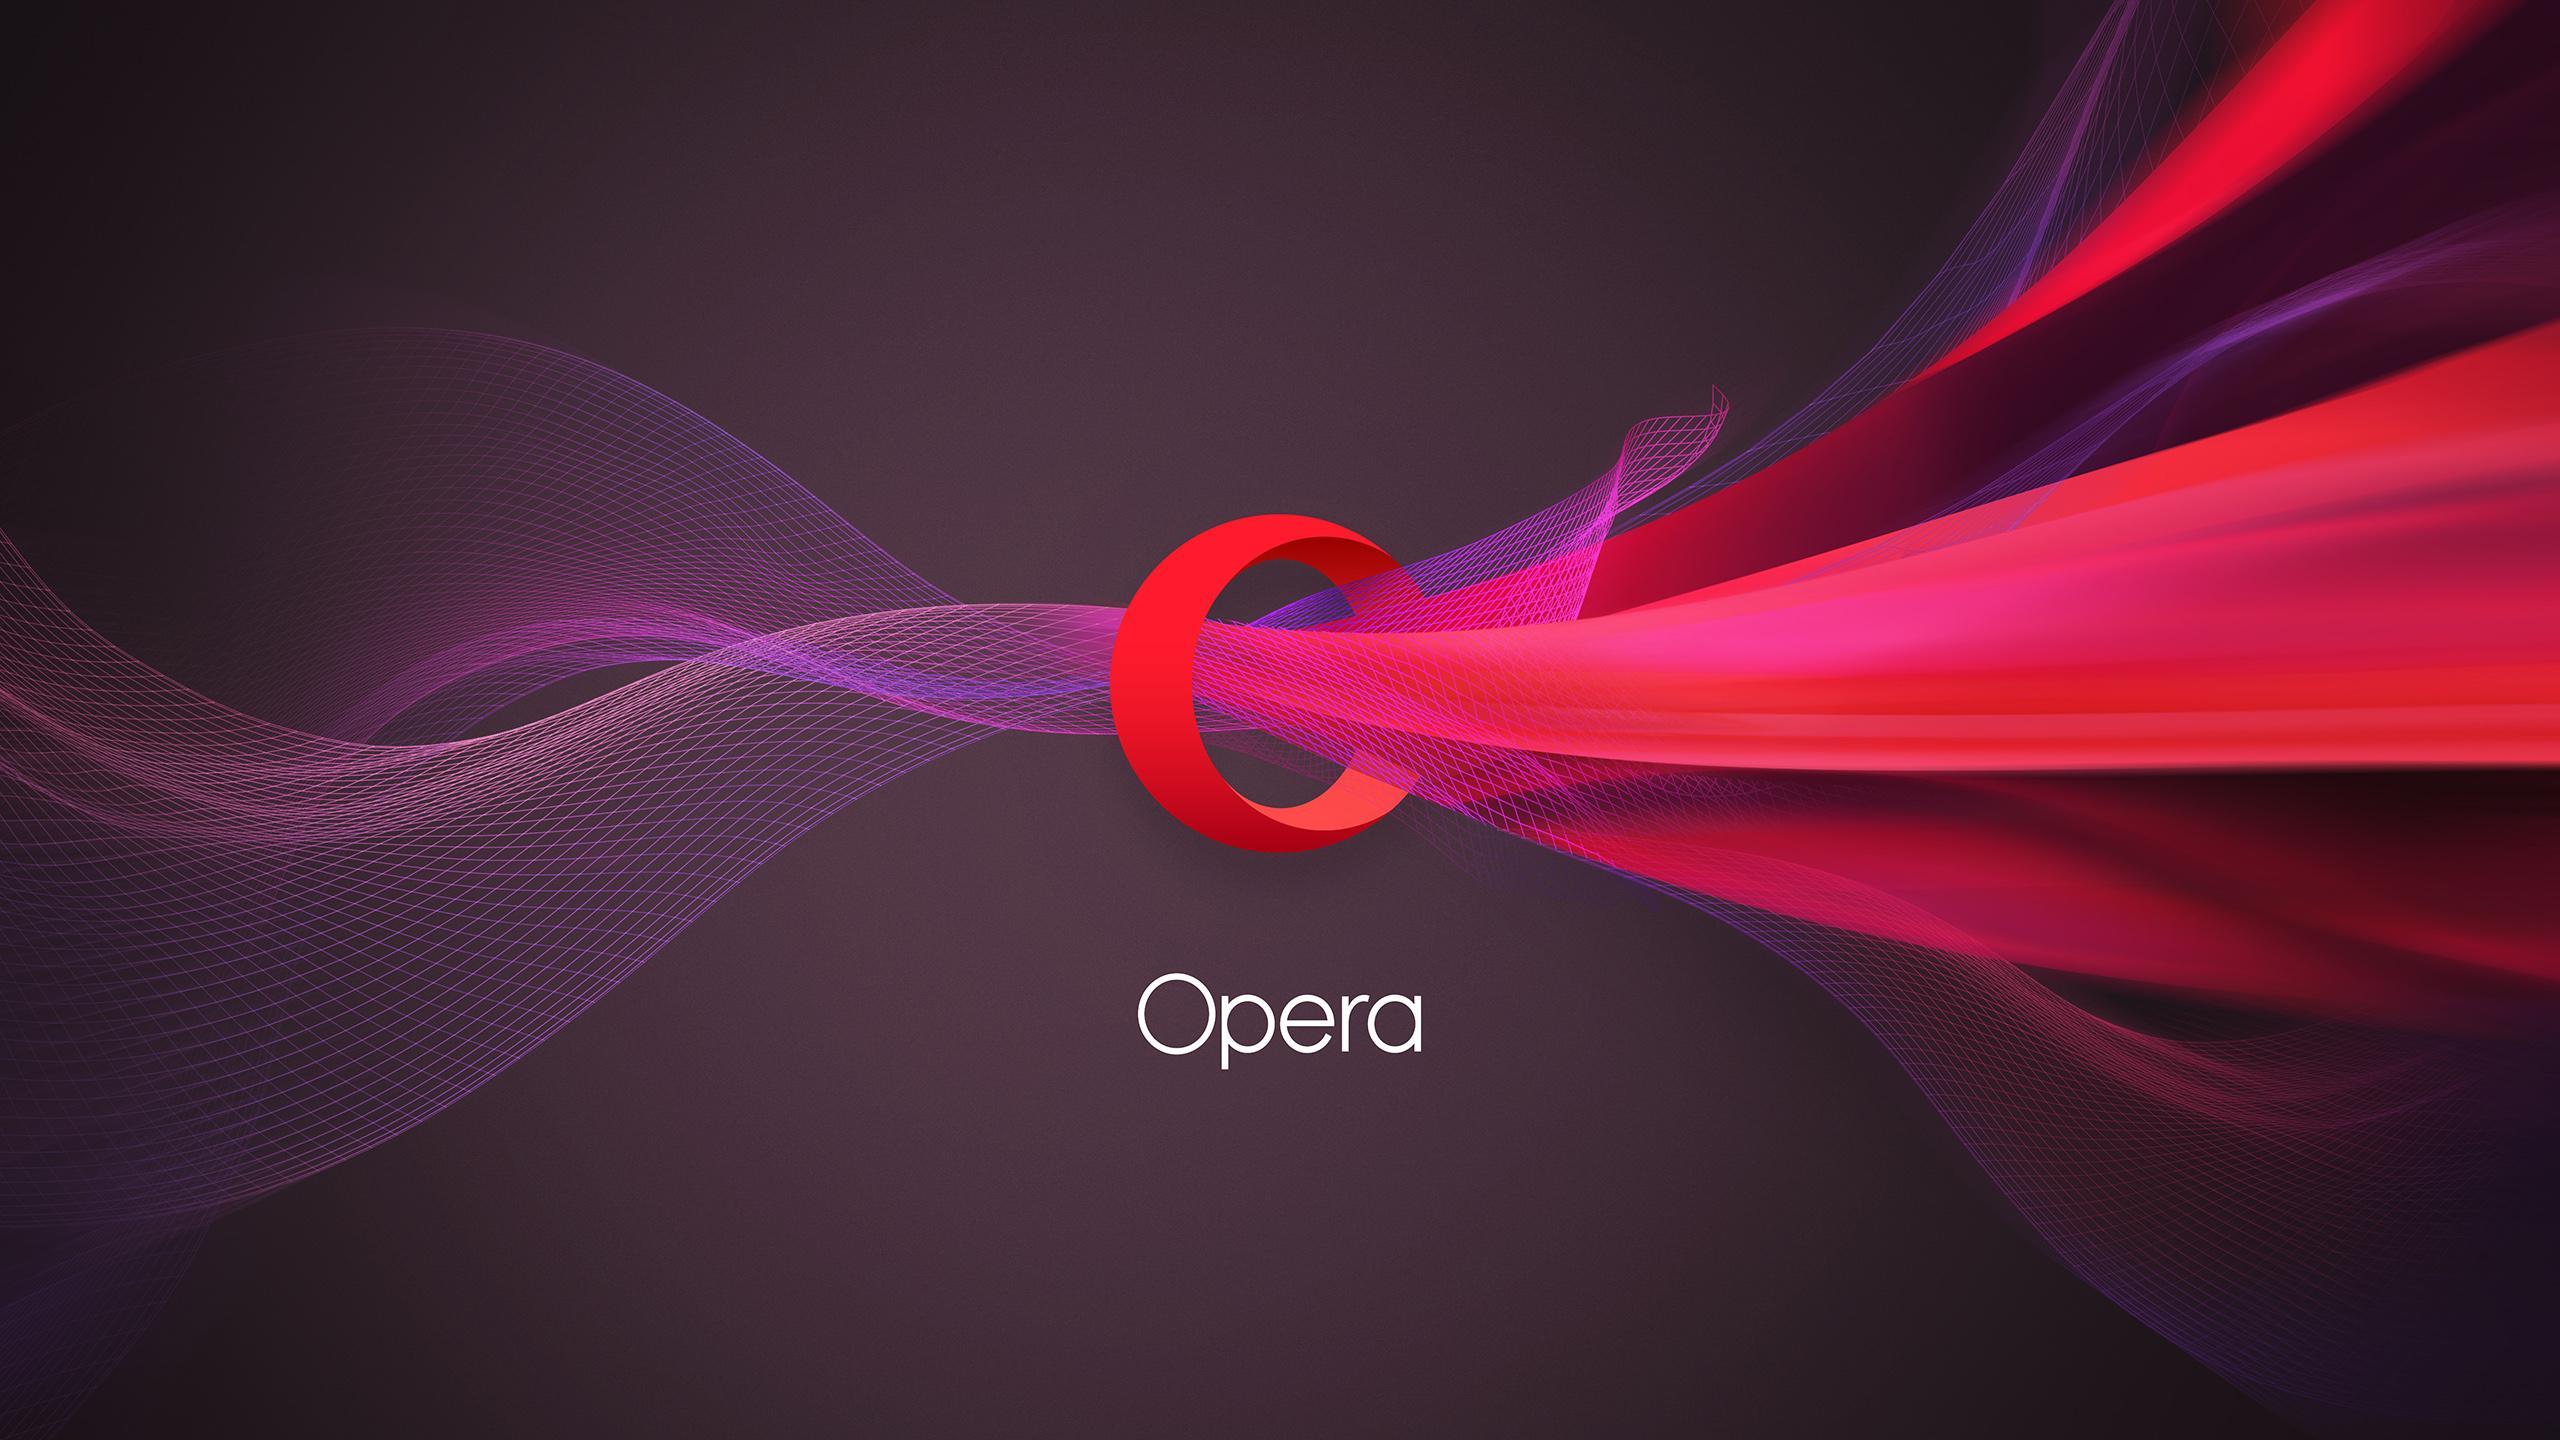 Opera sirve para evitar el minado oculto de criptomonedas